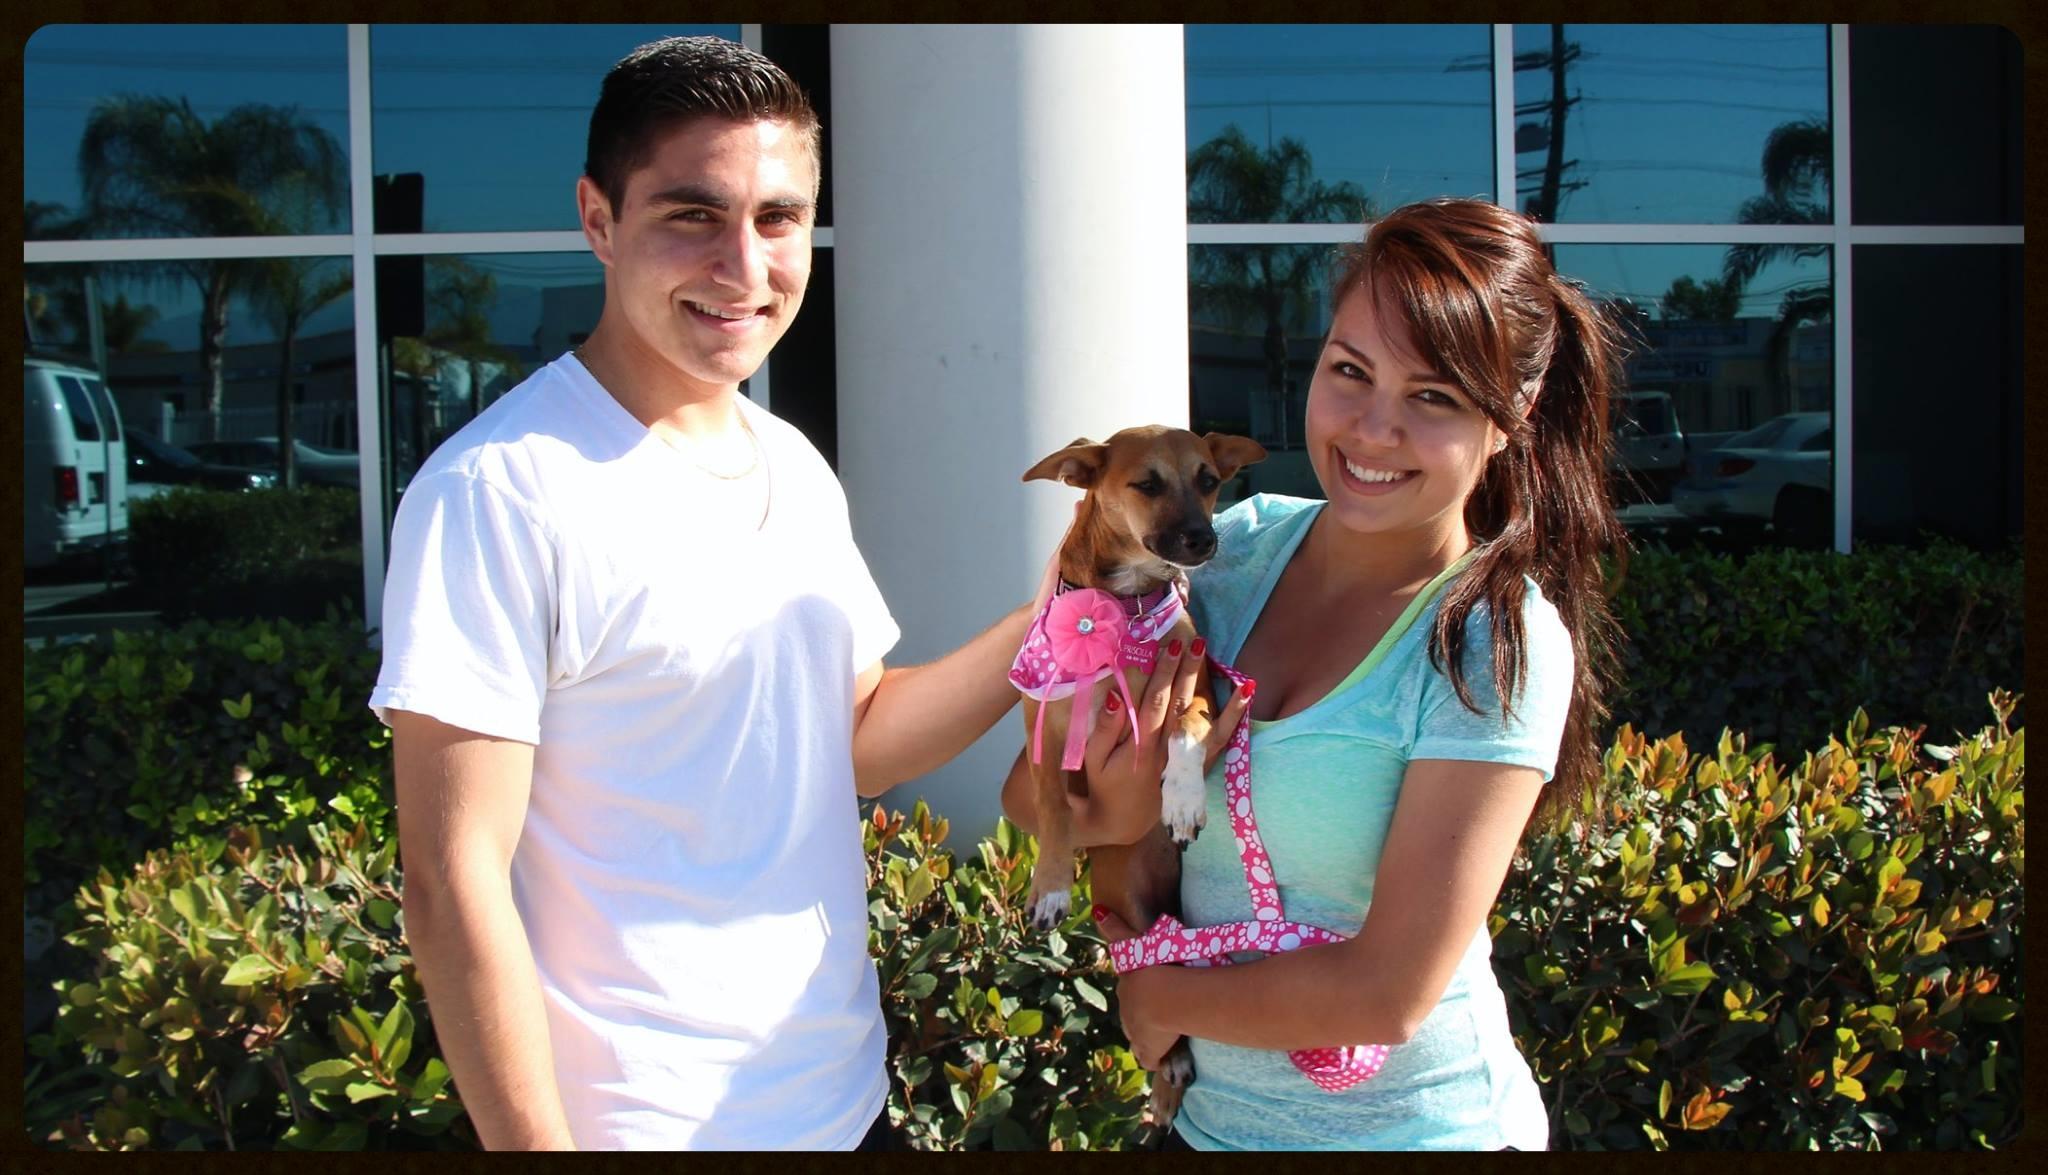 Percila's Adoption Photo